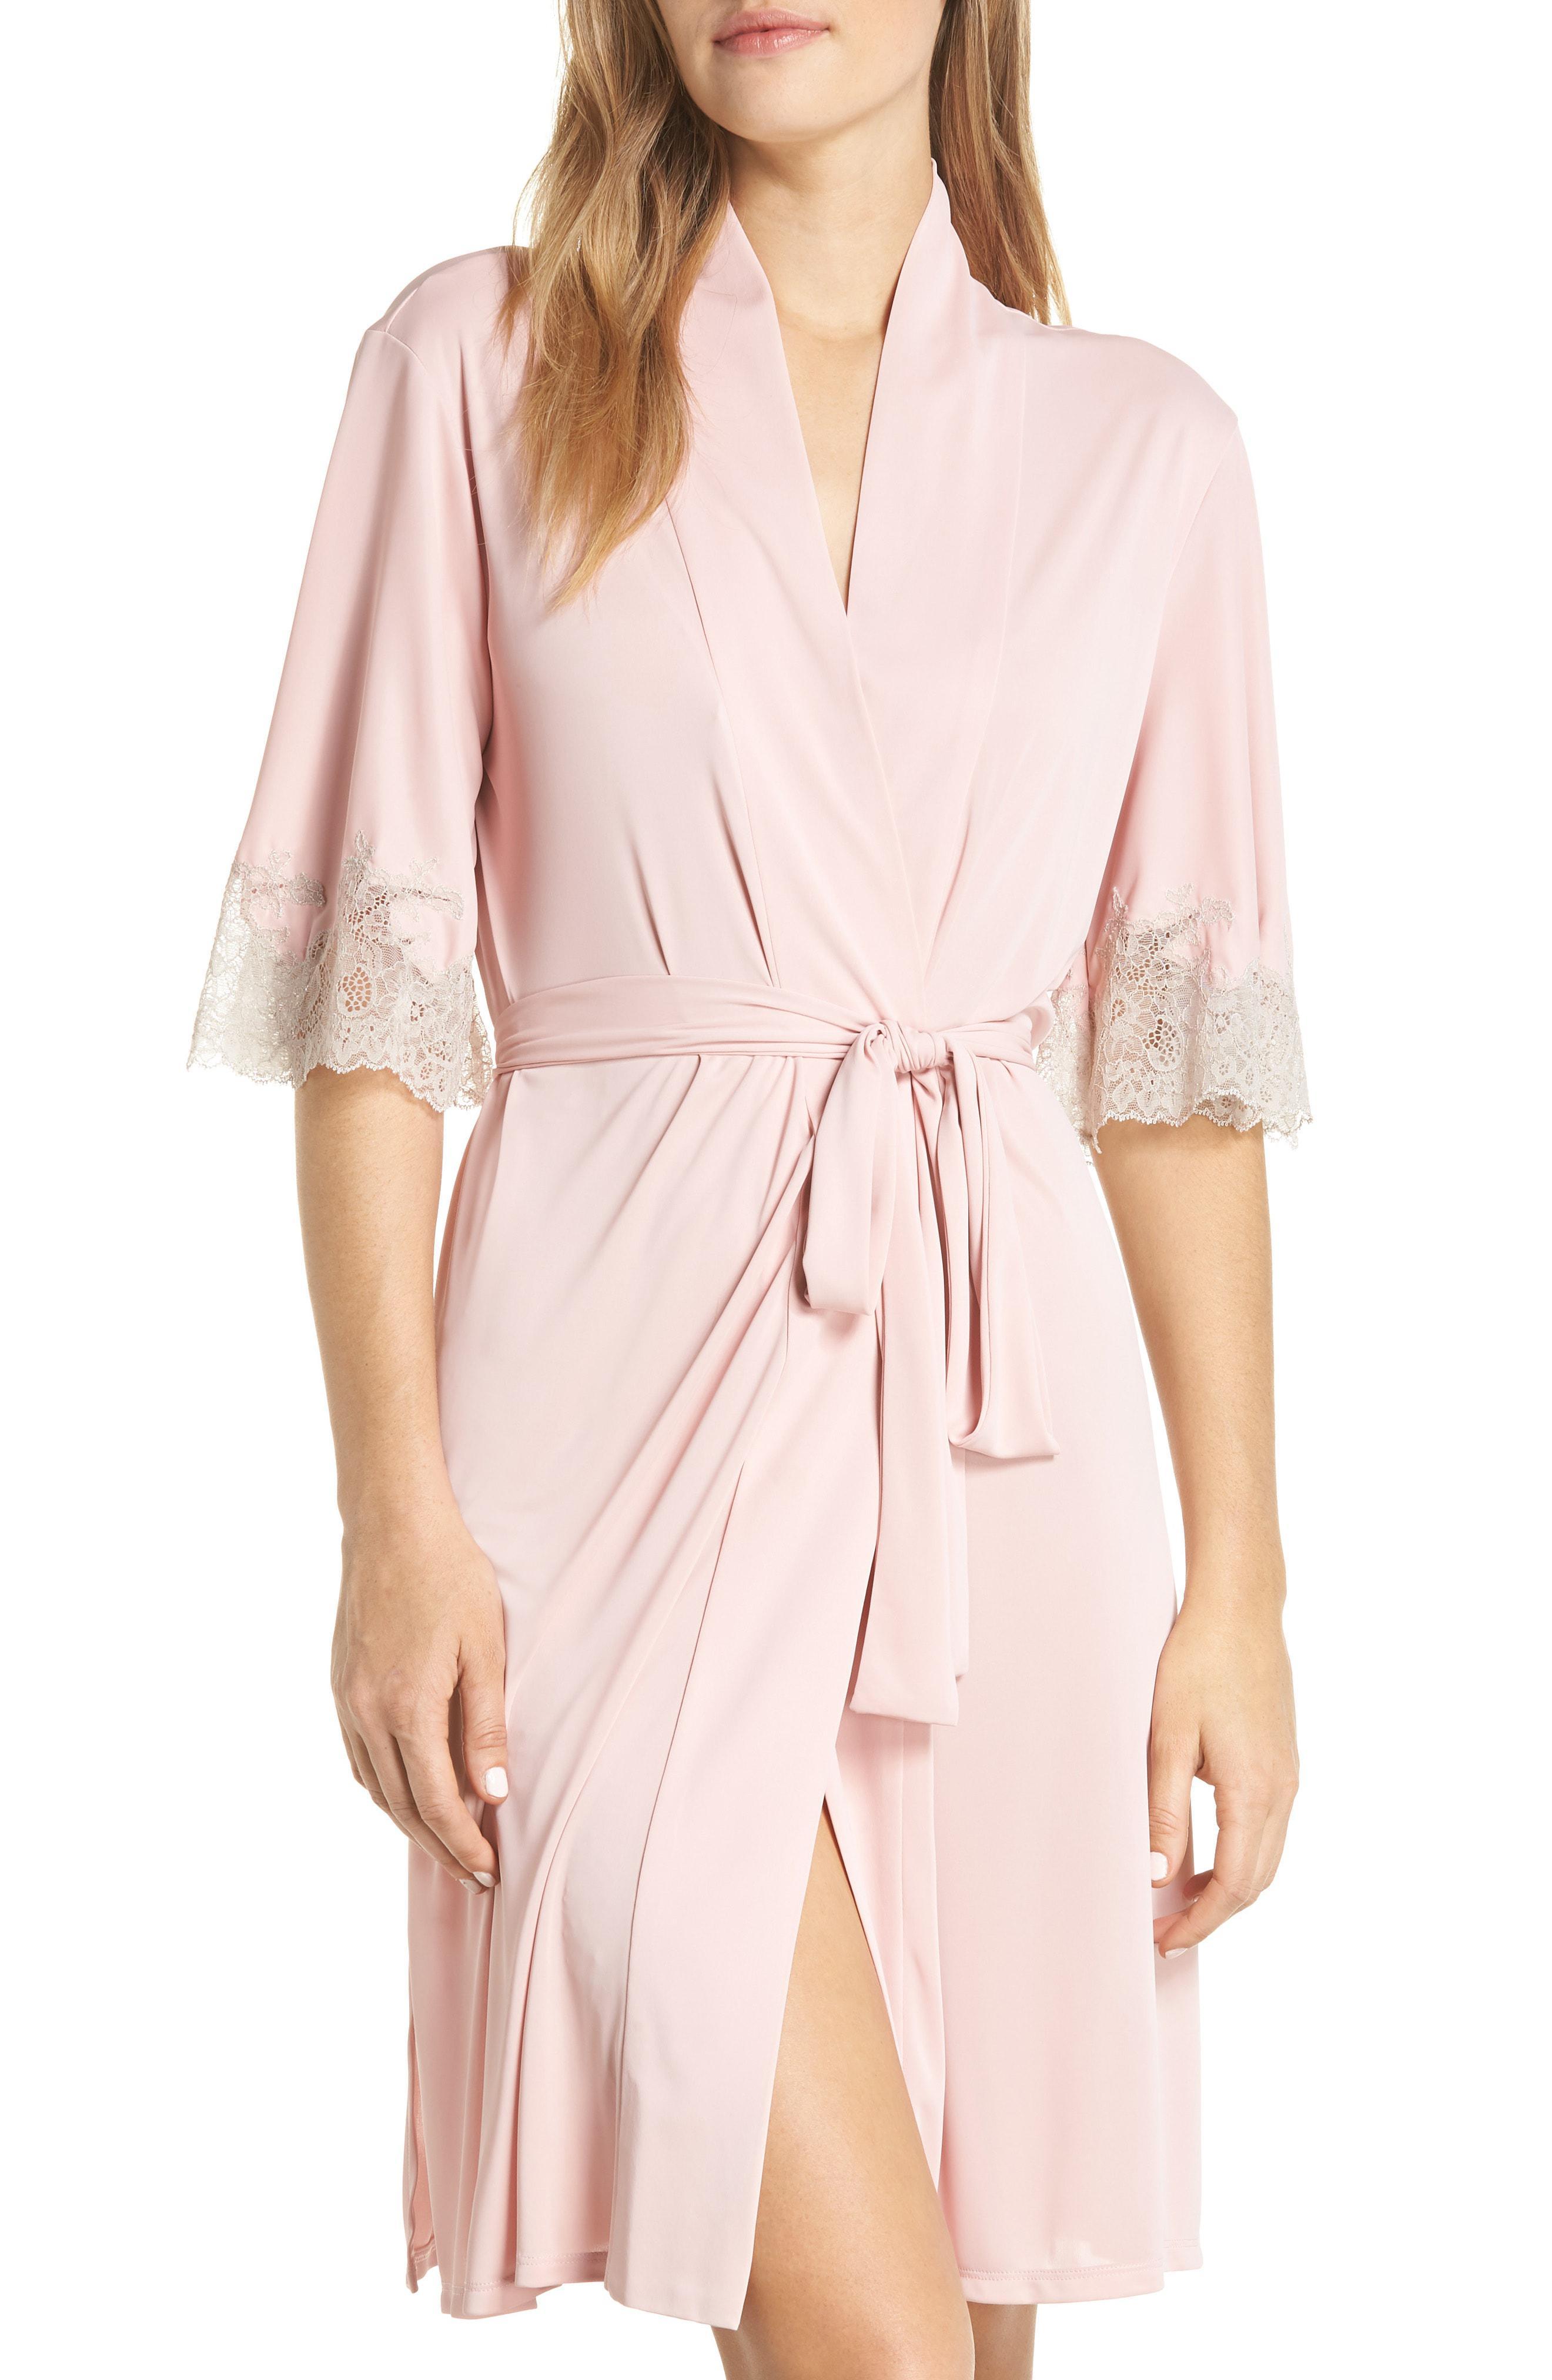 Lyst - Natori Enchant Lace Trim Wrap in Pink a7b50f7b6